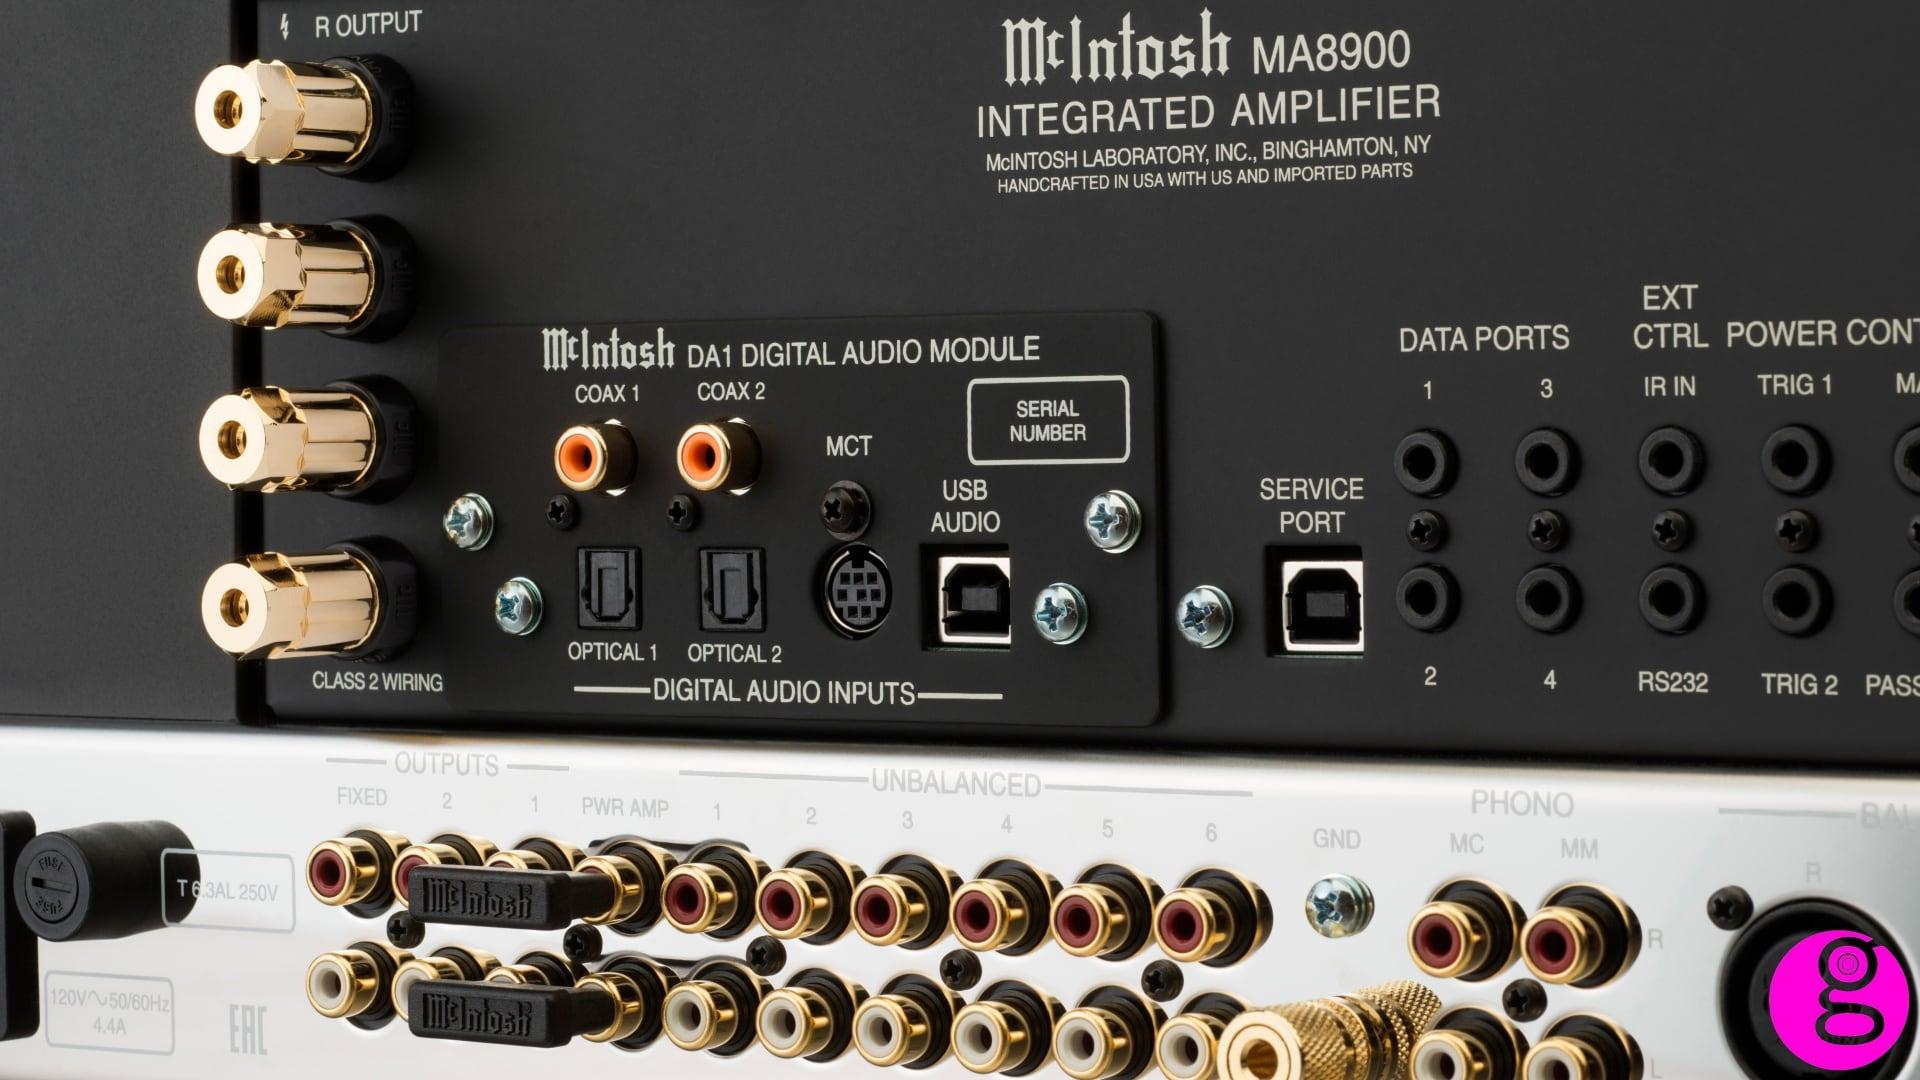 McIntosh MA 8900 Alex Giese Hannover